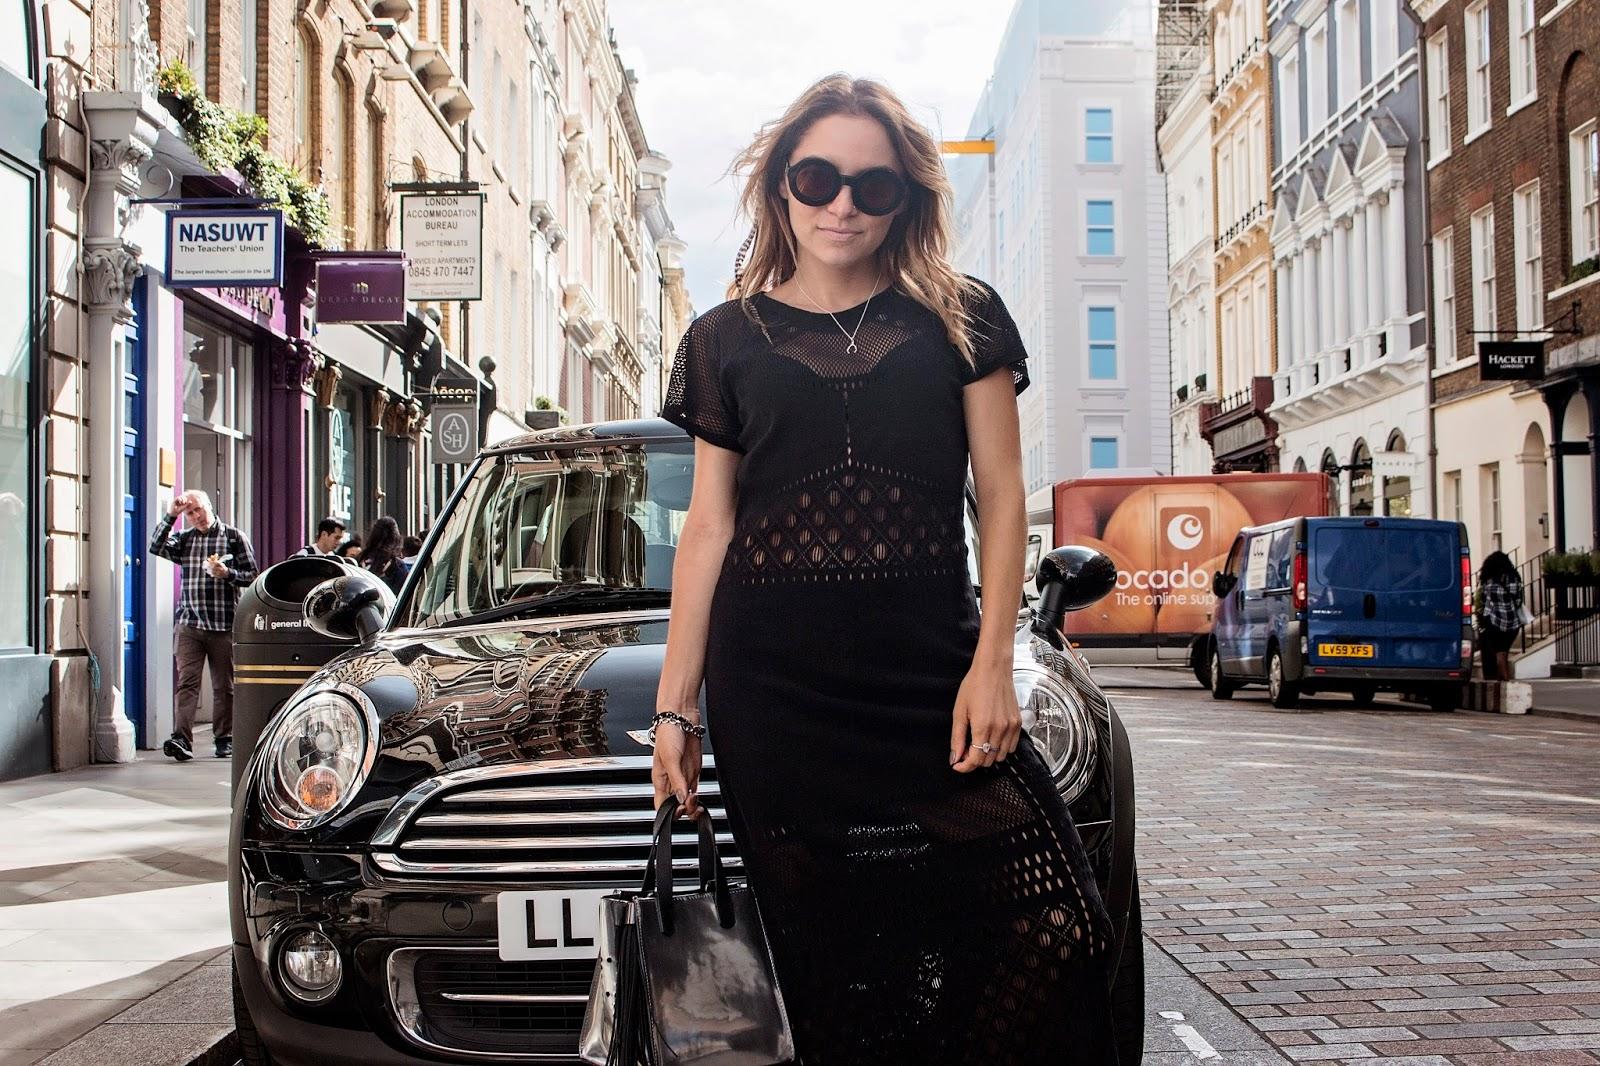 Whitney's Wonderland's Whitney Valverde UK Top Luxury Fashion Blogger wears Jets stretch knit midi dress, Wildfox round sunglasses, and Kurt Geiger flatform sandals.